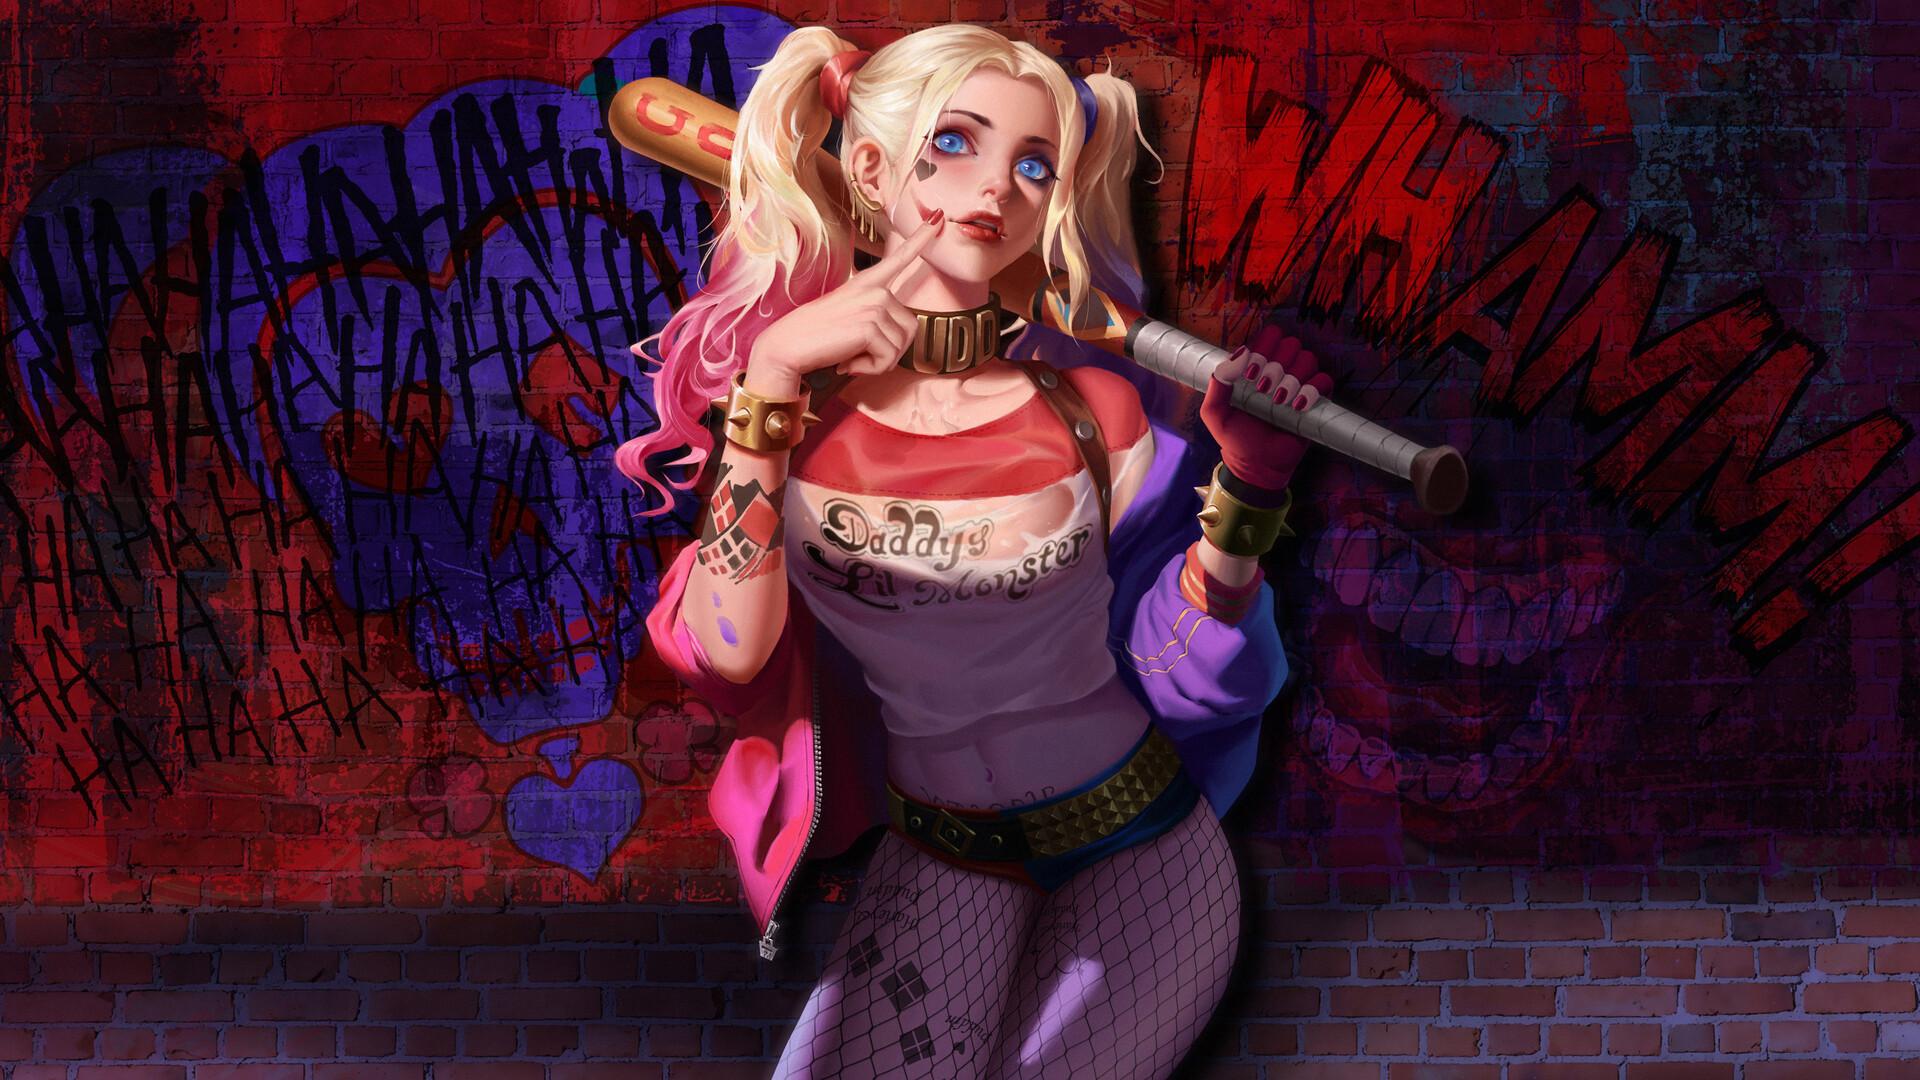 Gaming Pc Wallpaper For Girls 1920x1080 Artwork Harley Quinn 4k Laptop Full Hd 1080p Hd